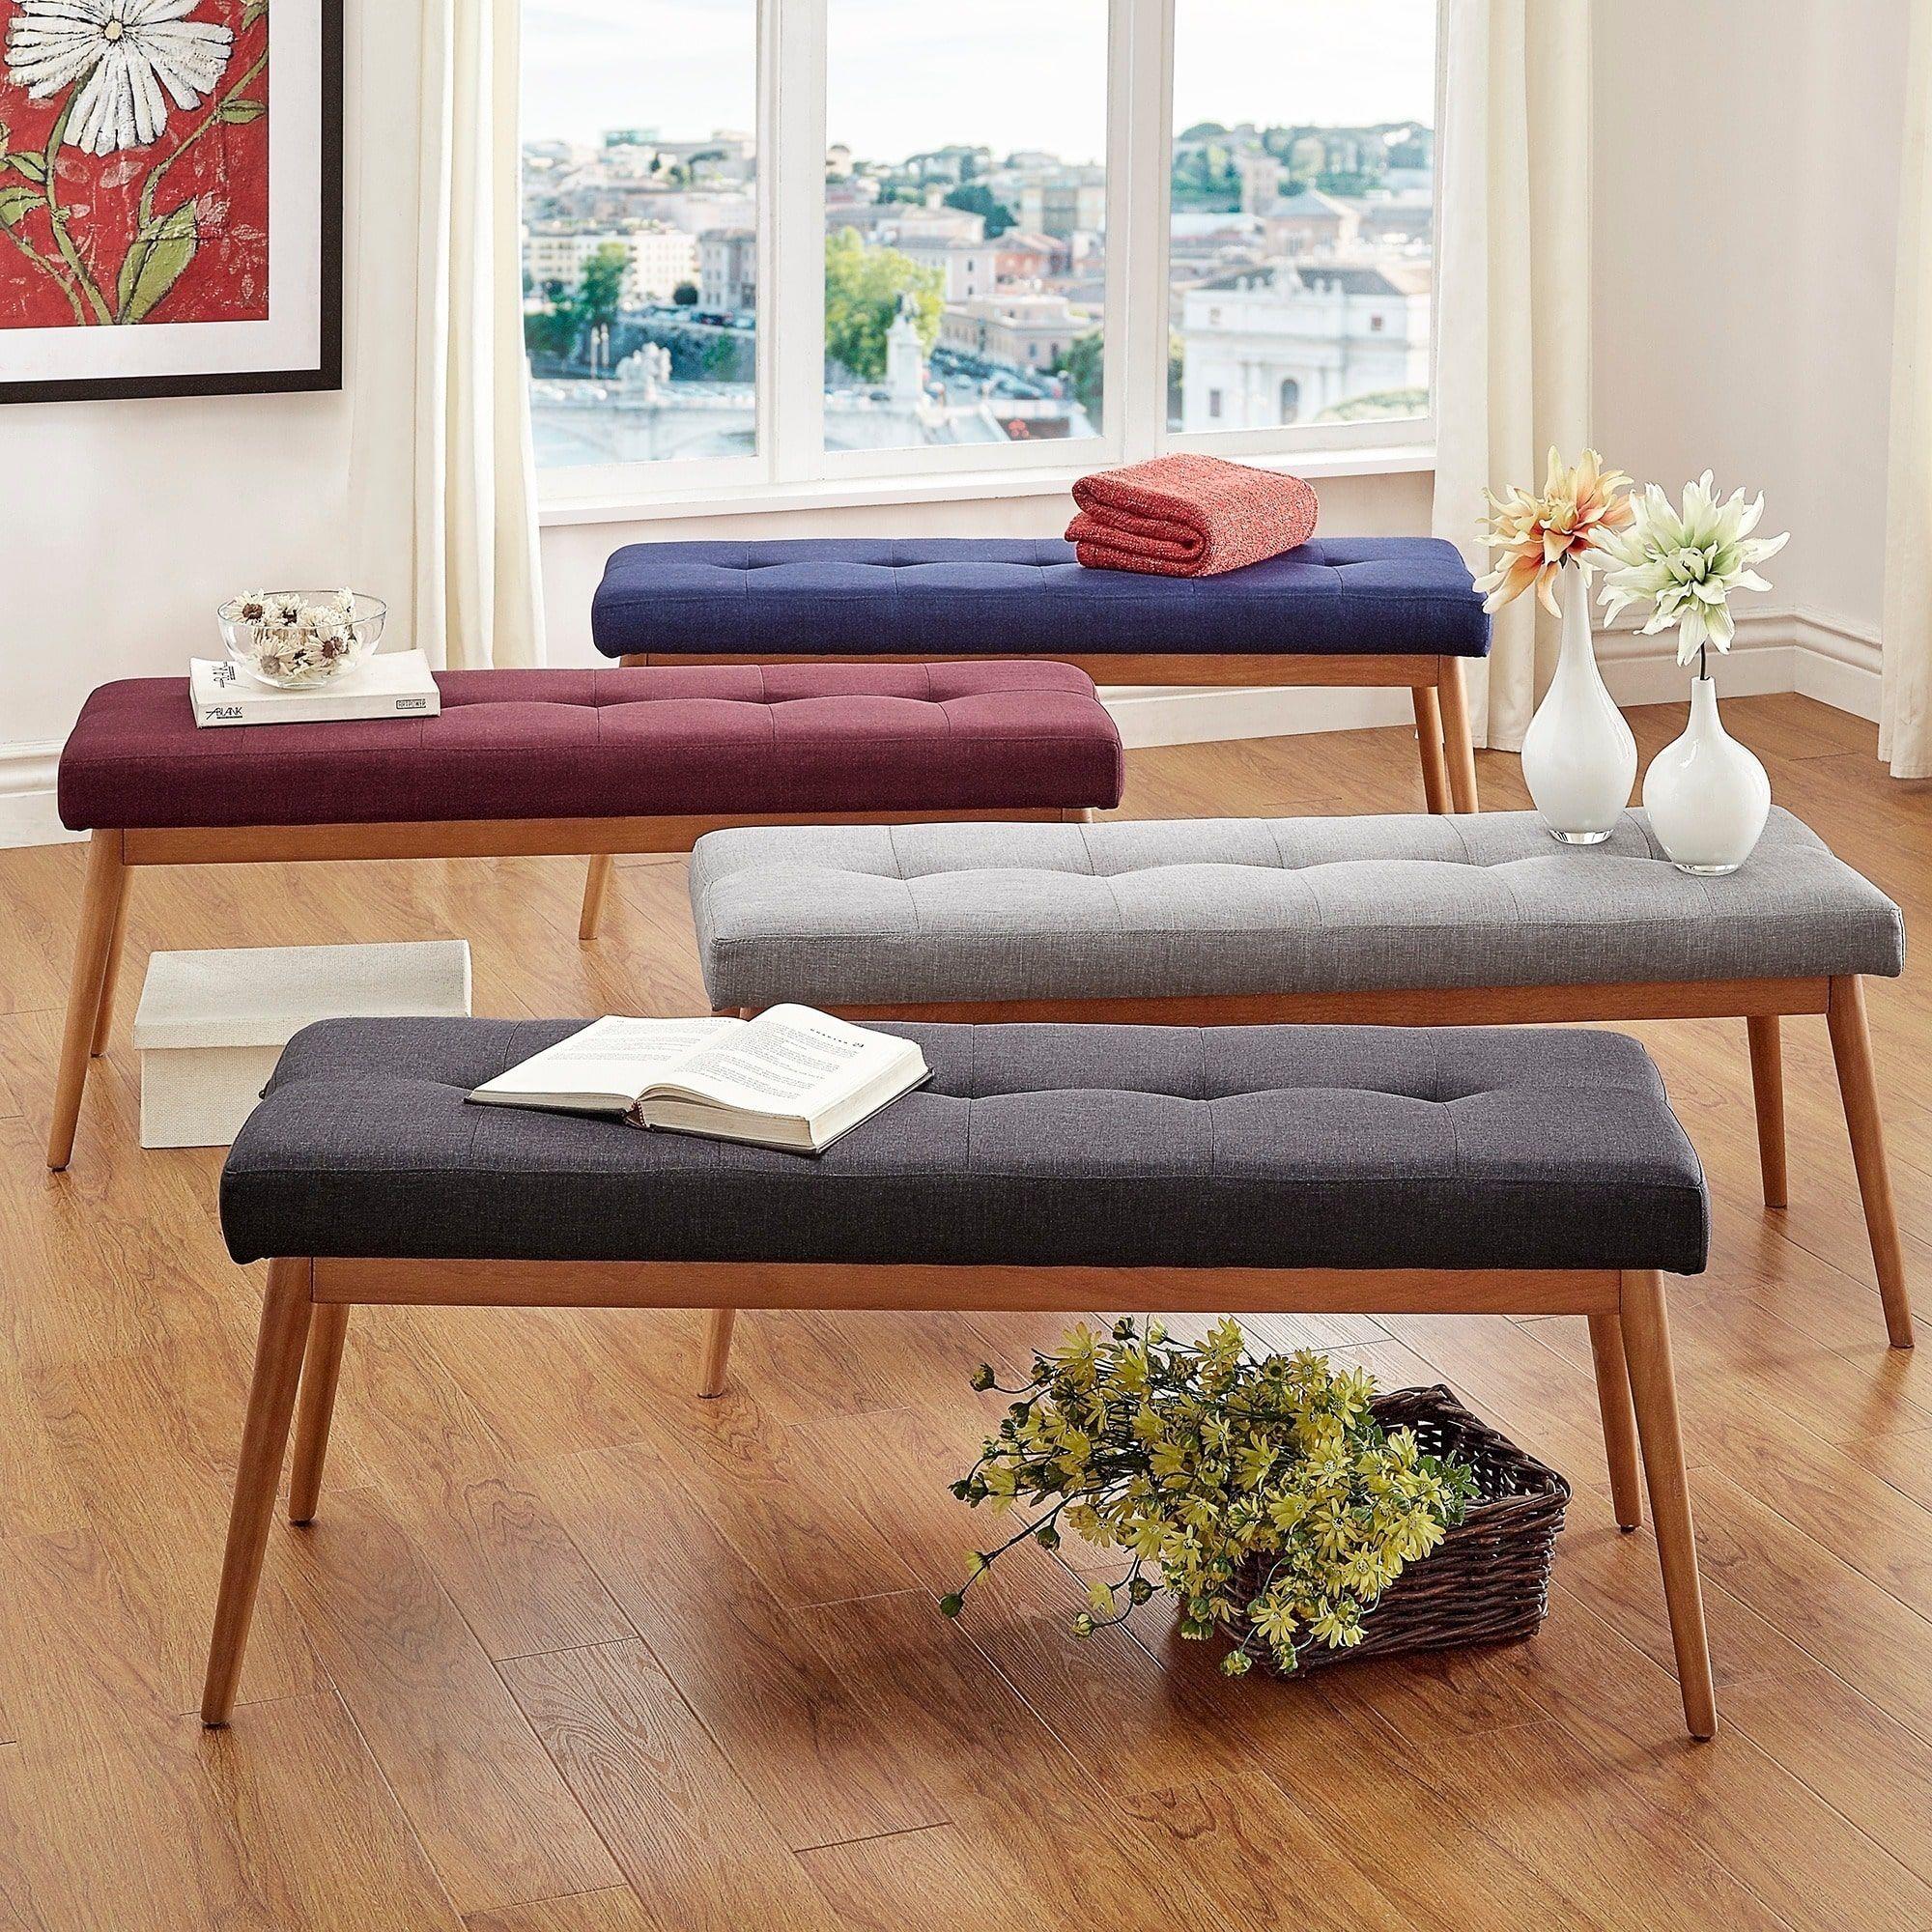 Sasha Oak Angled Leg Linen Dining Bench by MID-CENTURY LIVING |  Overstock.com